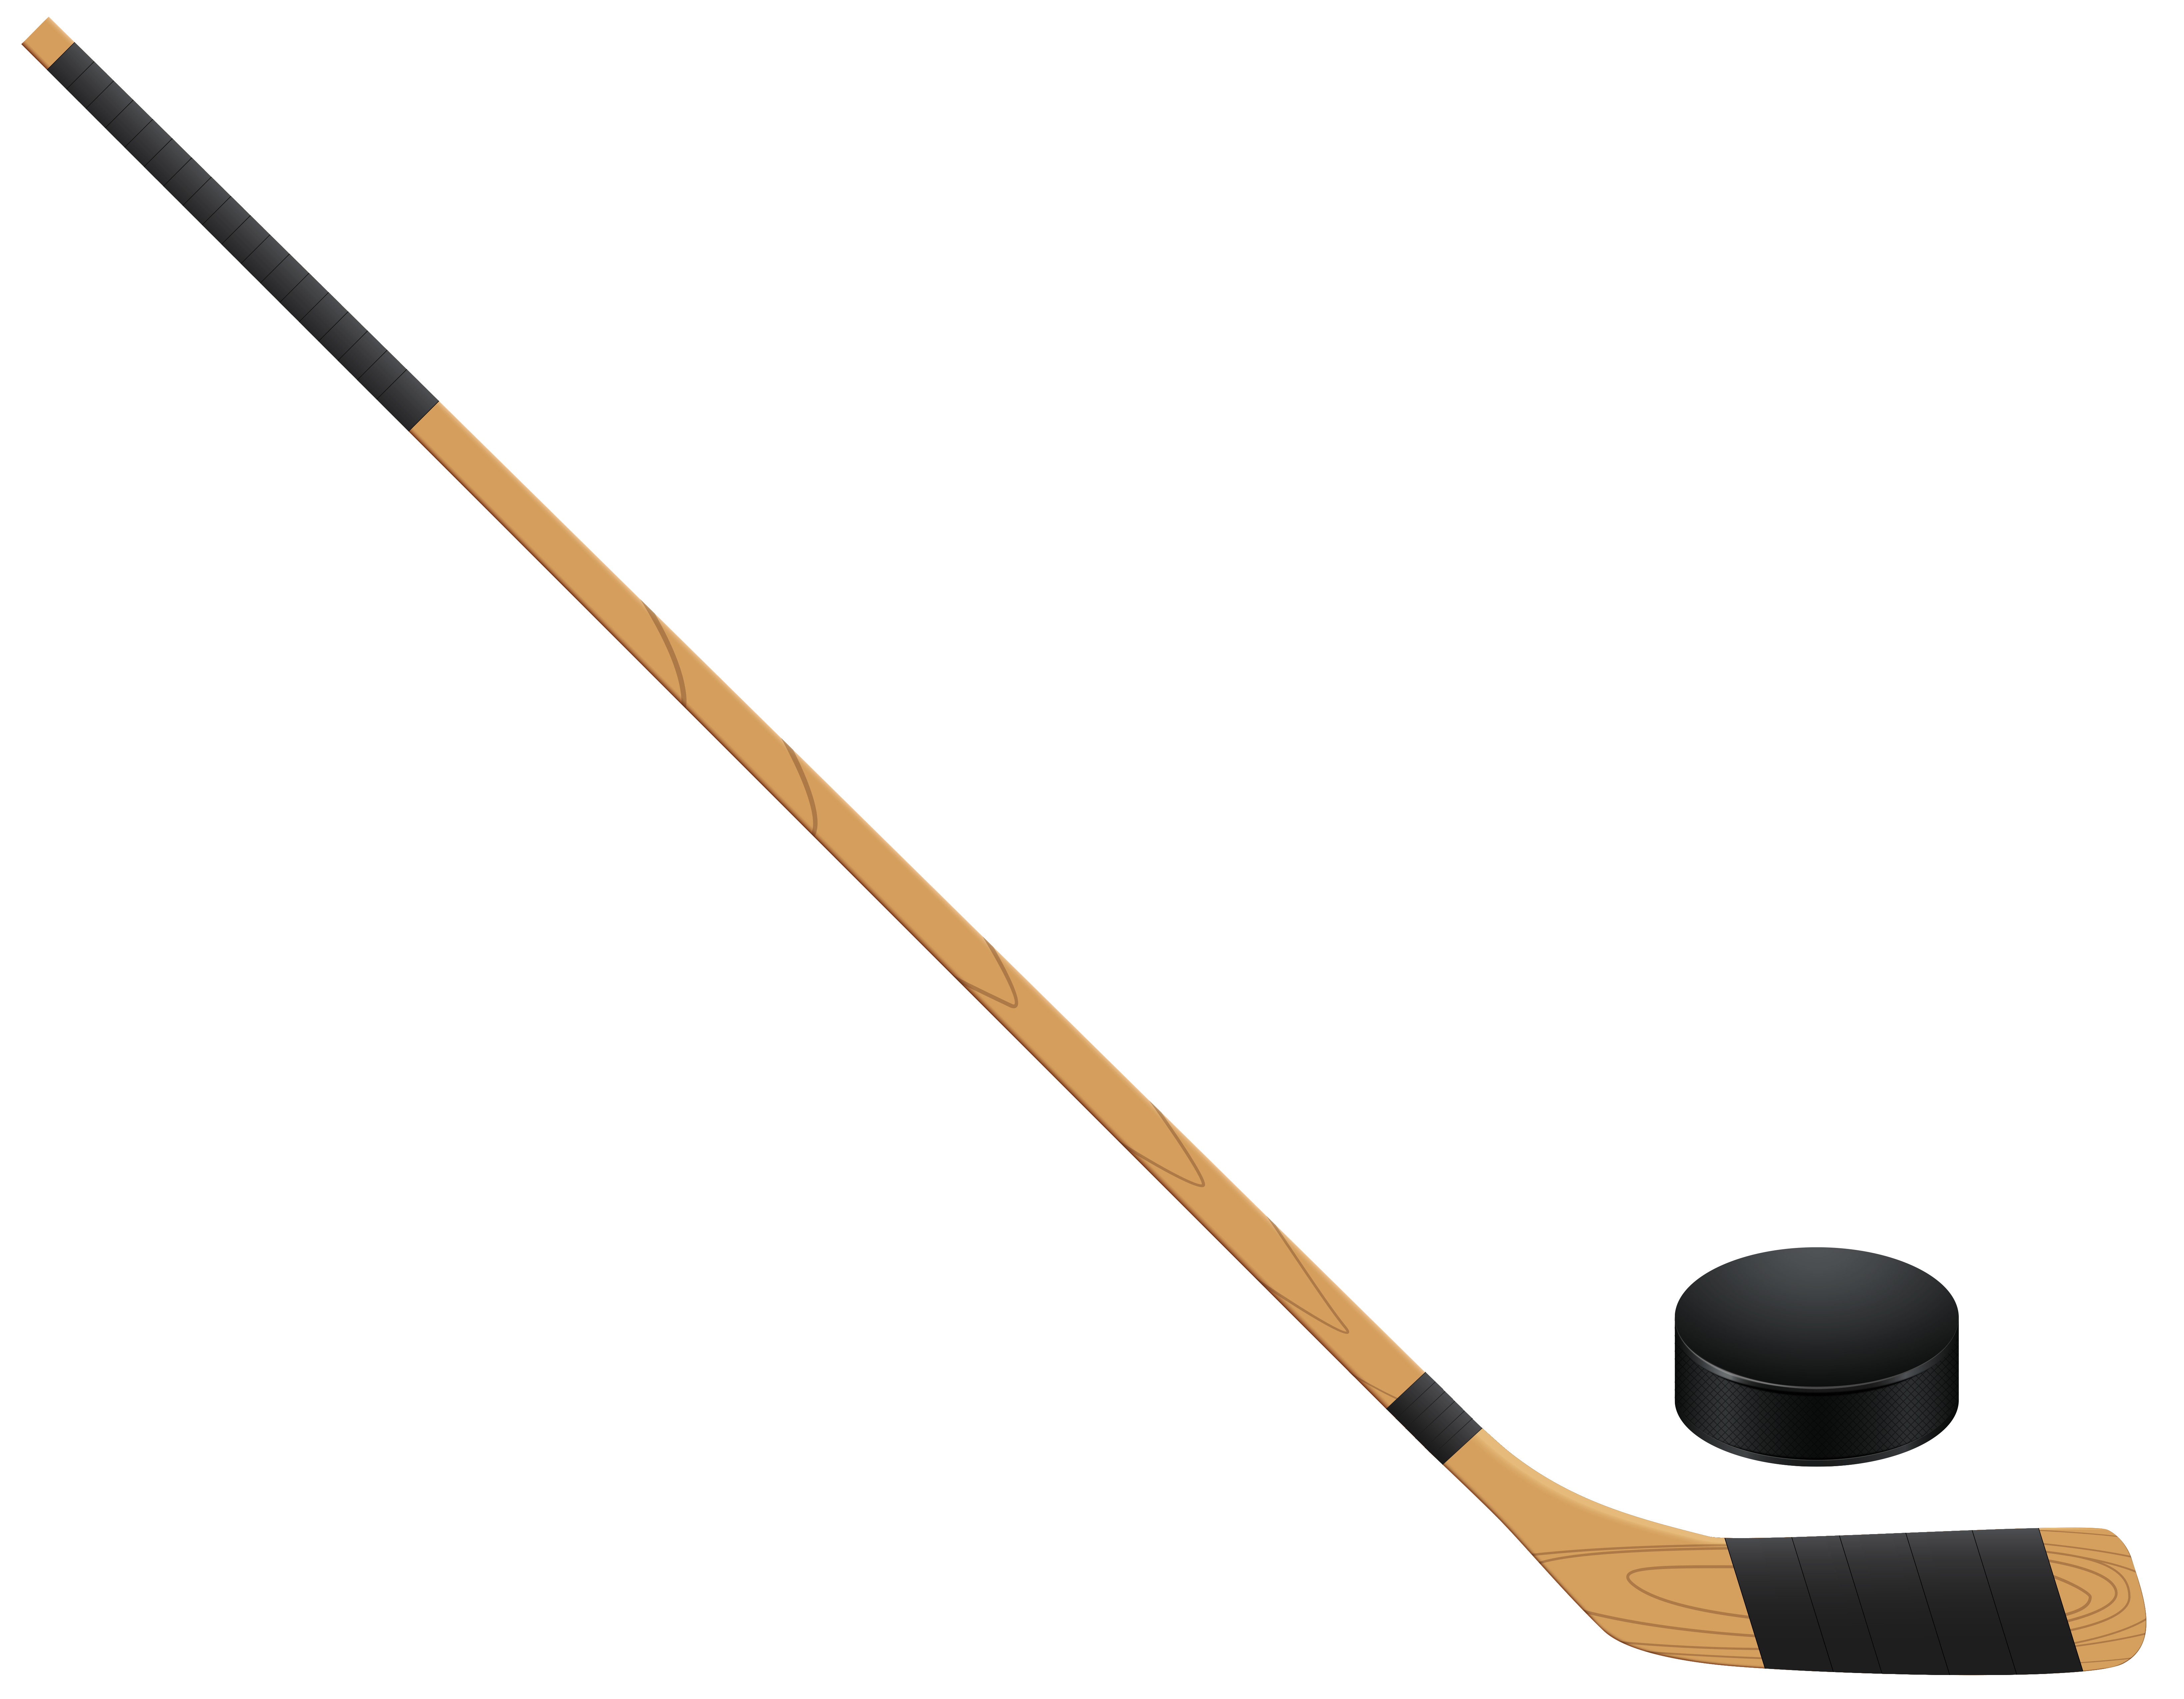 Hockey clipart bat. Stickand puck png clip